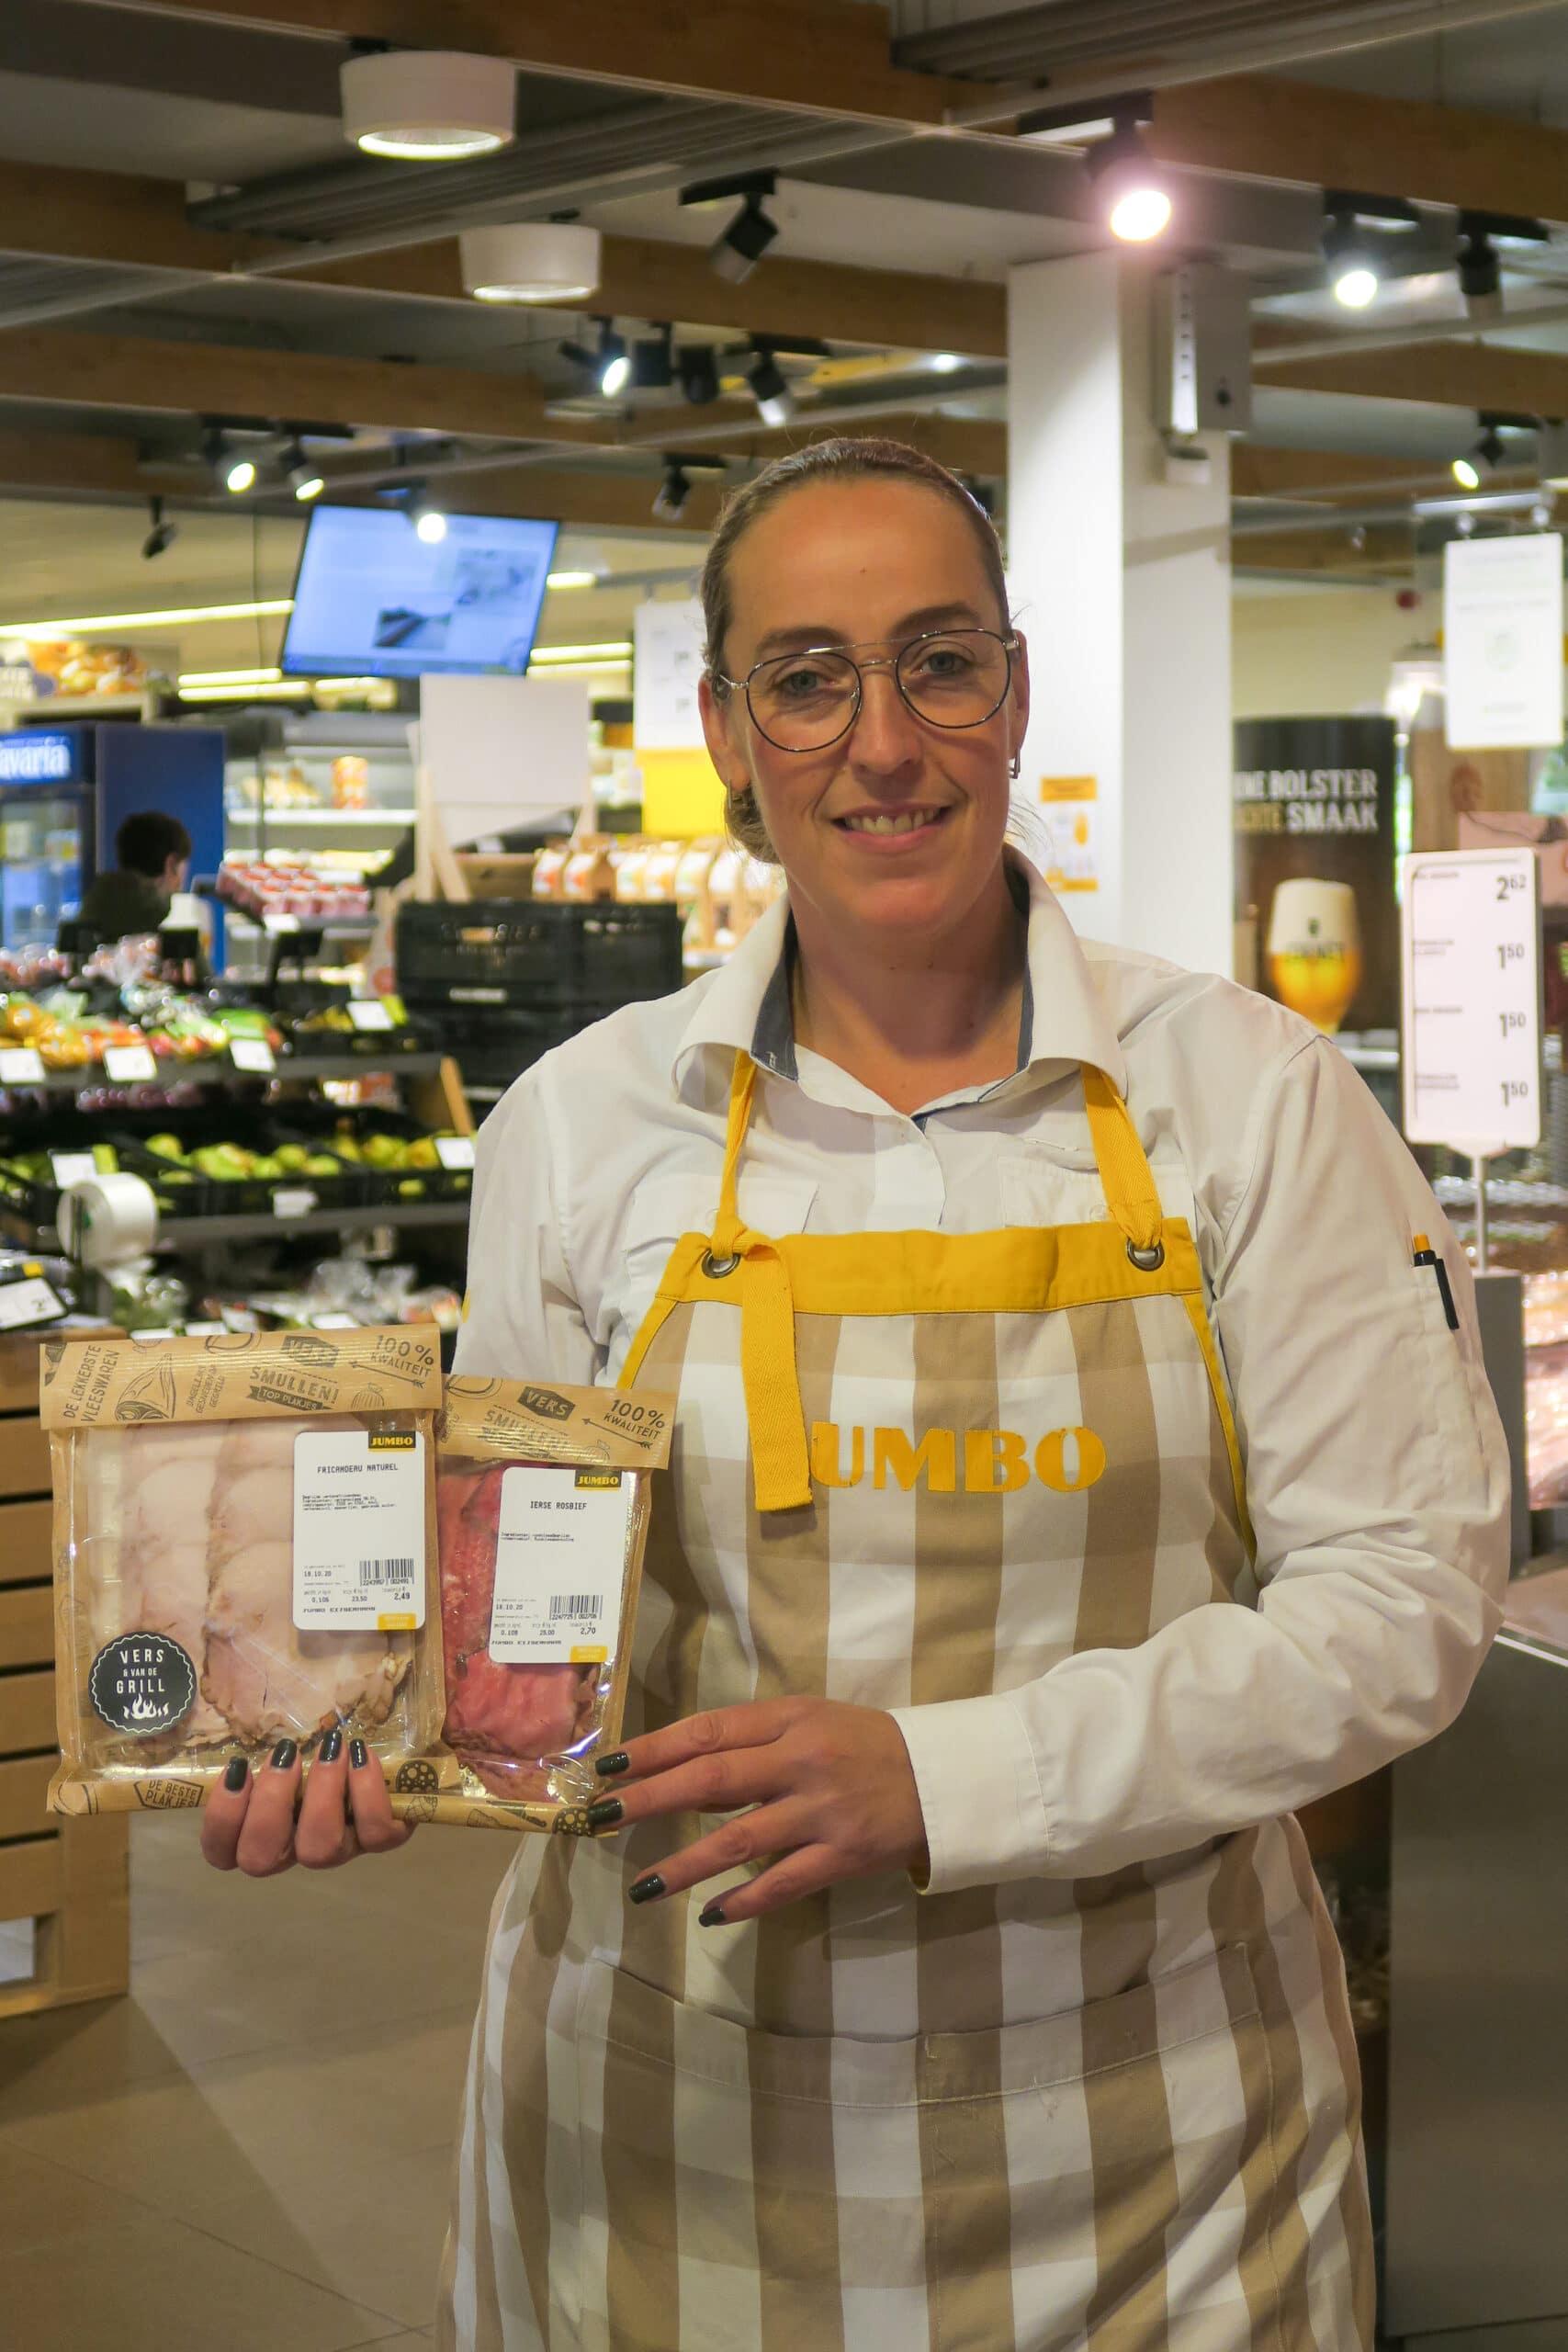 Tessa, leidinggevende bakkerij en versplein Jumbo Eijsermans in Zeeland (Landerd)